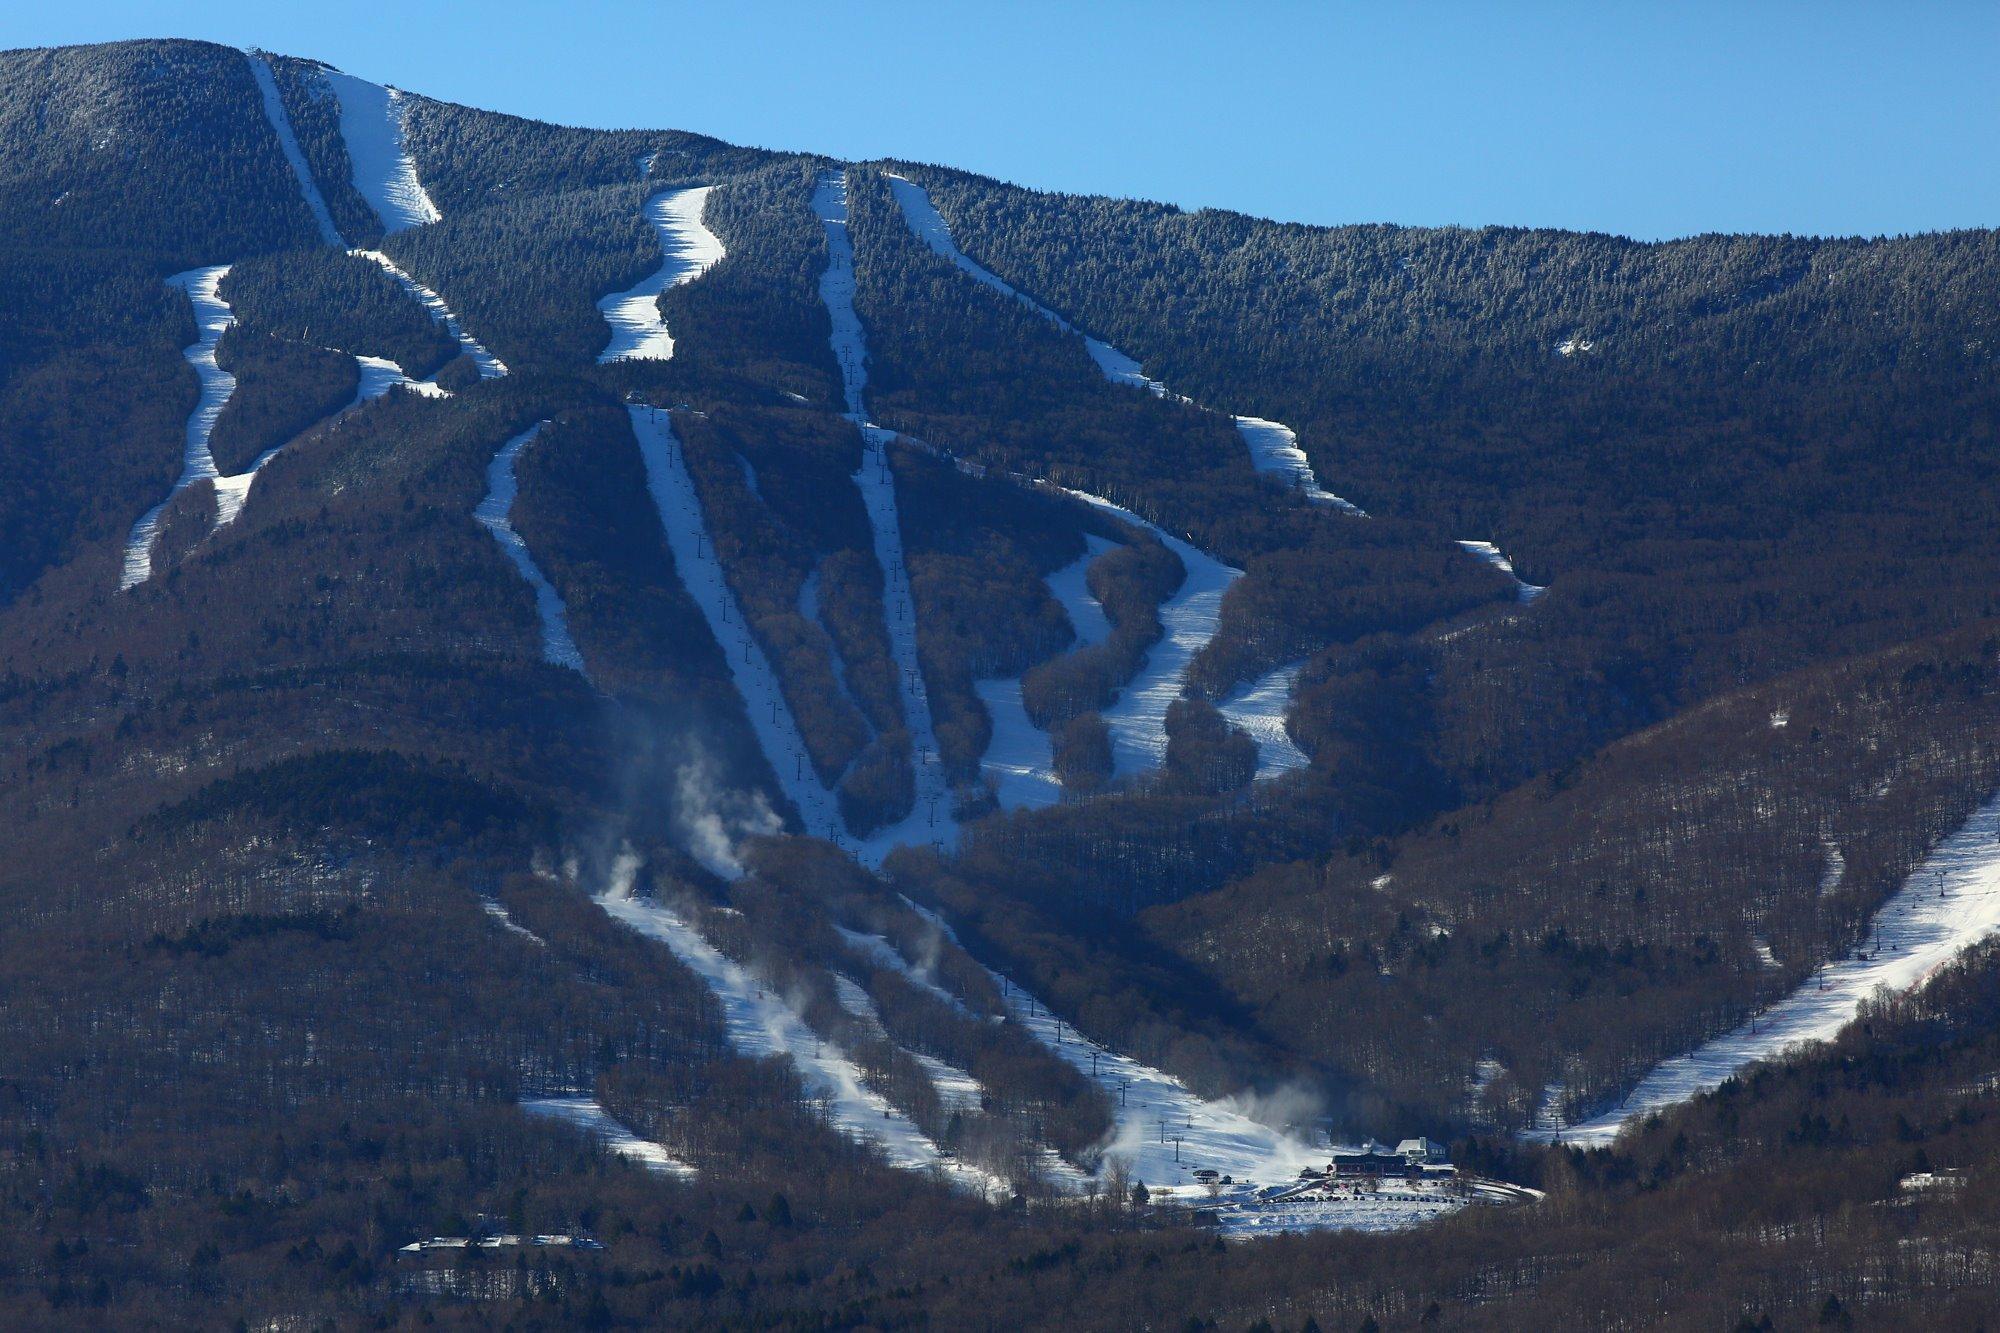 skier dies after crashing into tree in vermont